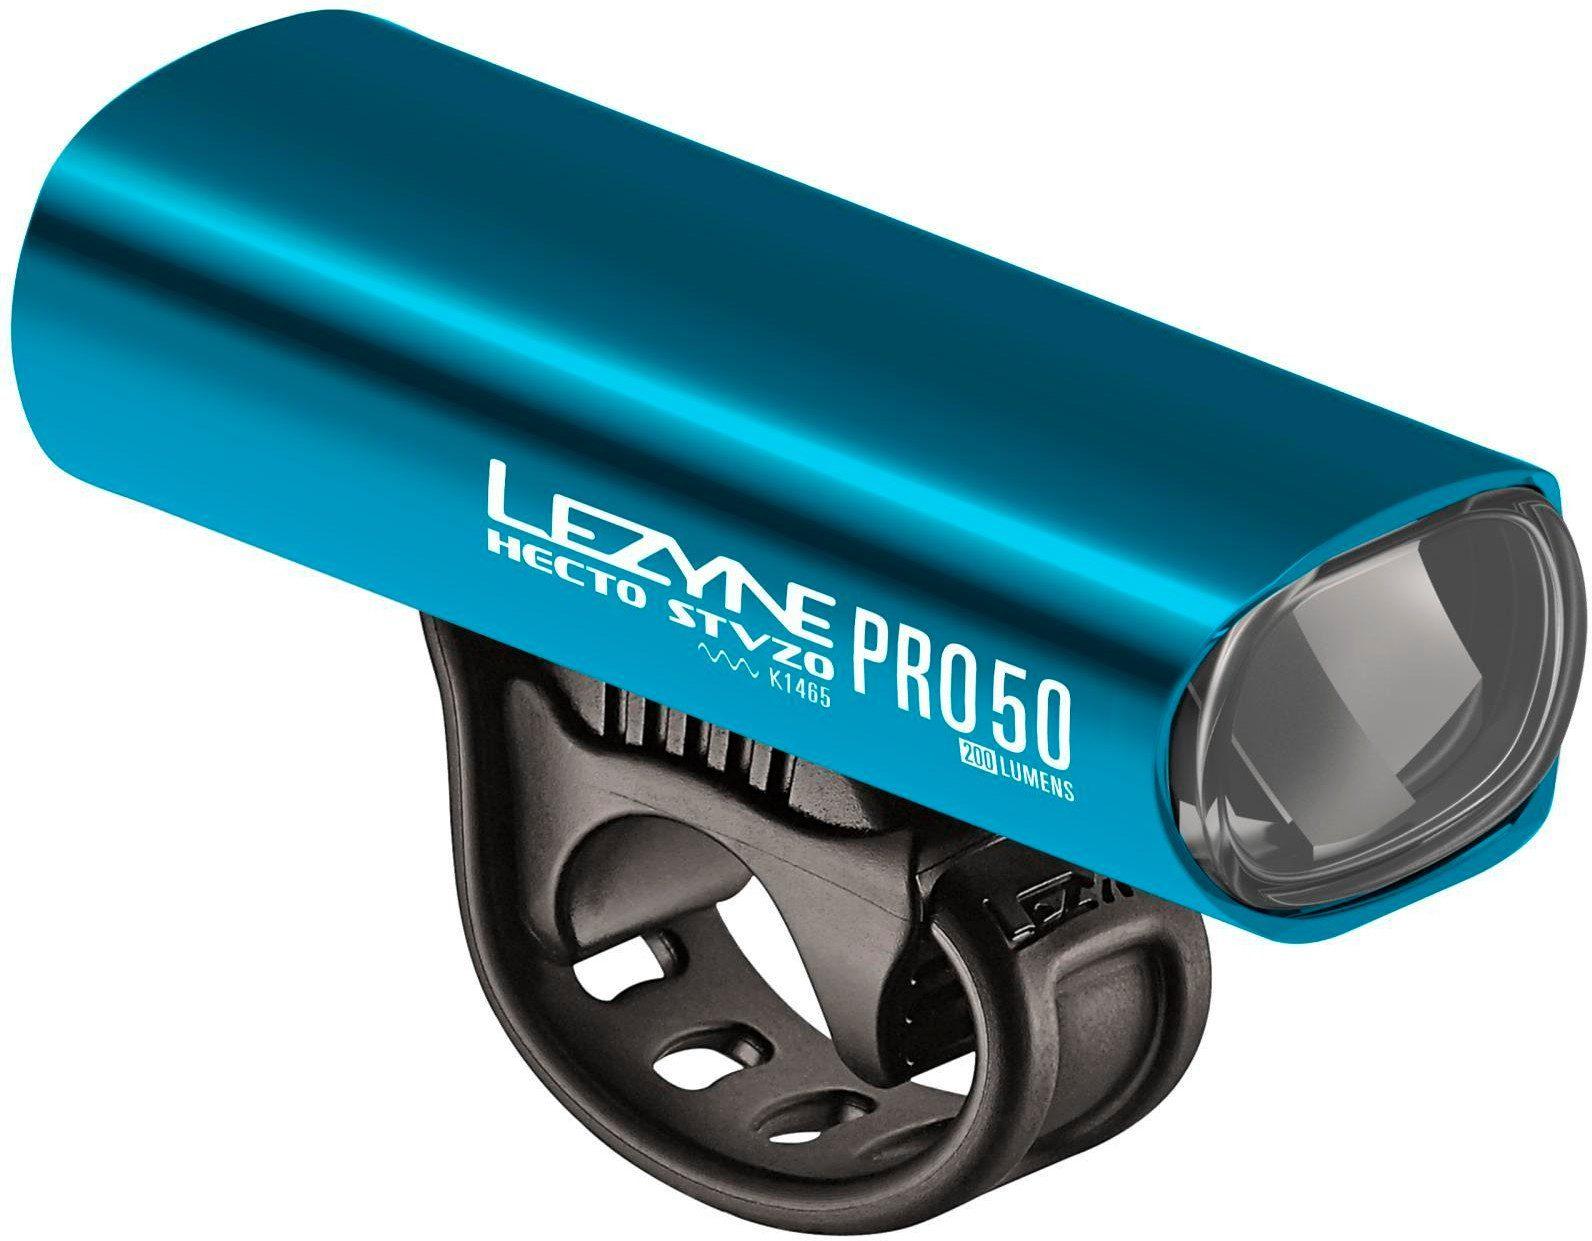 Lezyne Fahrradbeleuchtung »Hecto Drive Pro 50 Frontlicht StVZO Y11«